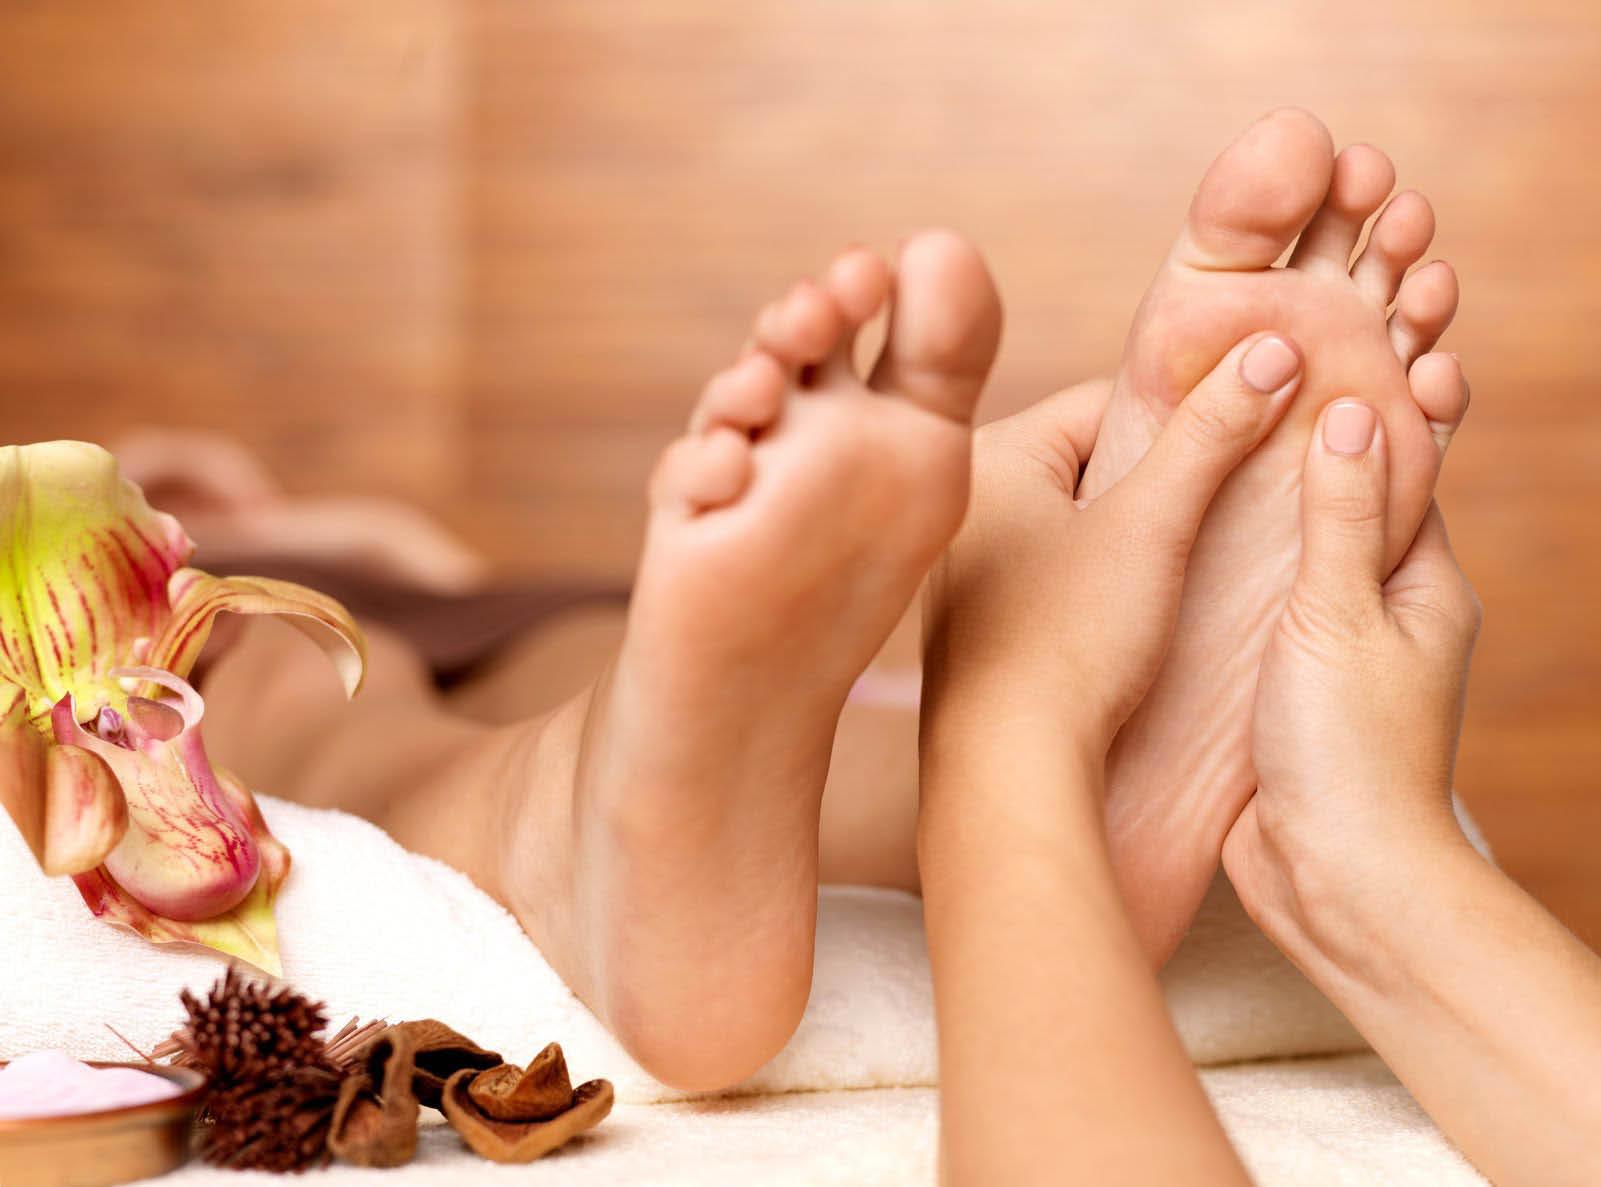 Spalation Ultimate Massage Retreat's Picture of a Reflexology Foot Massage